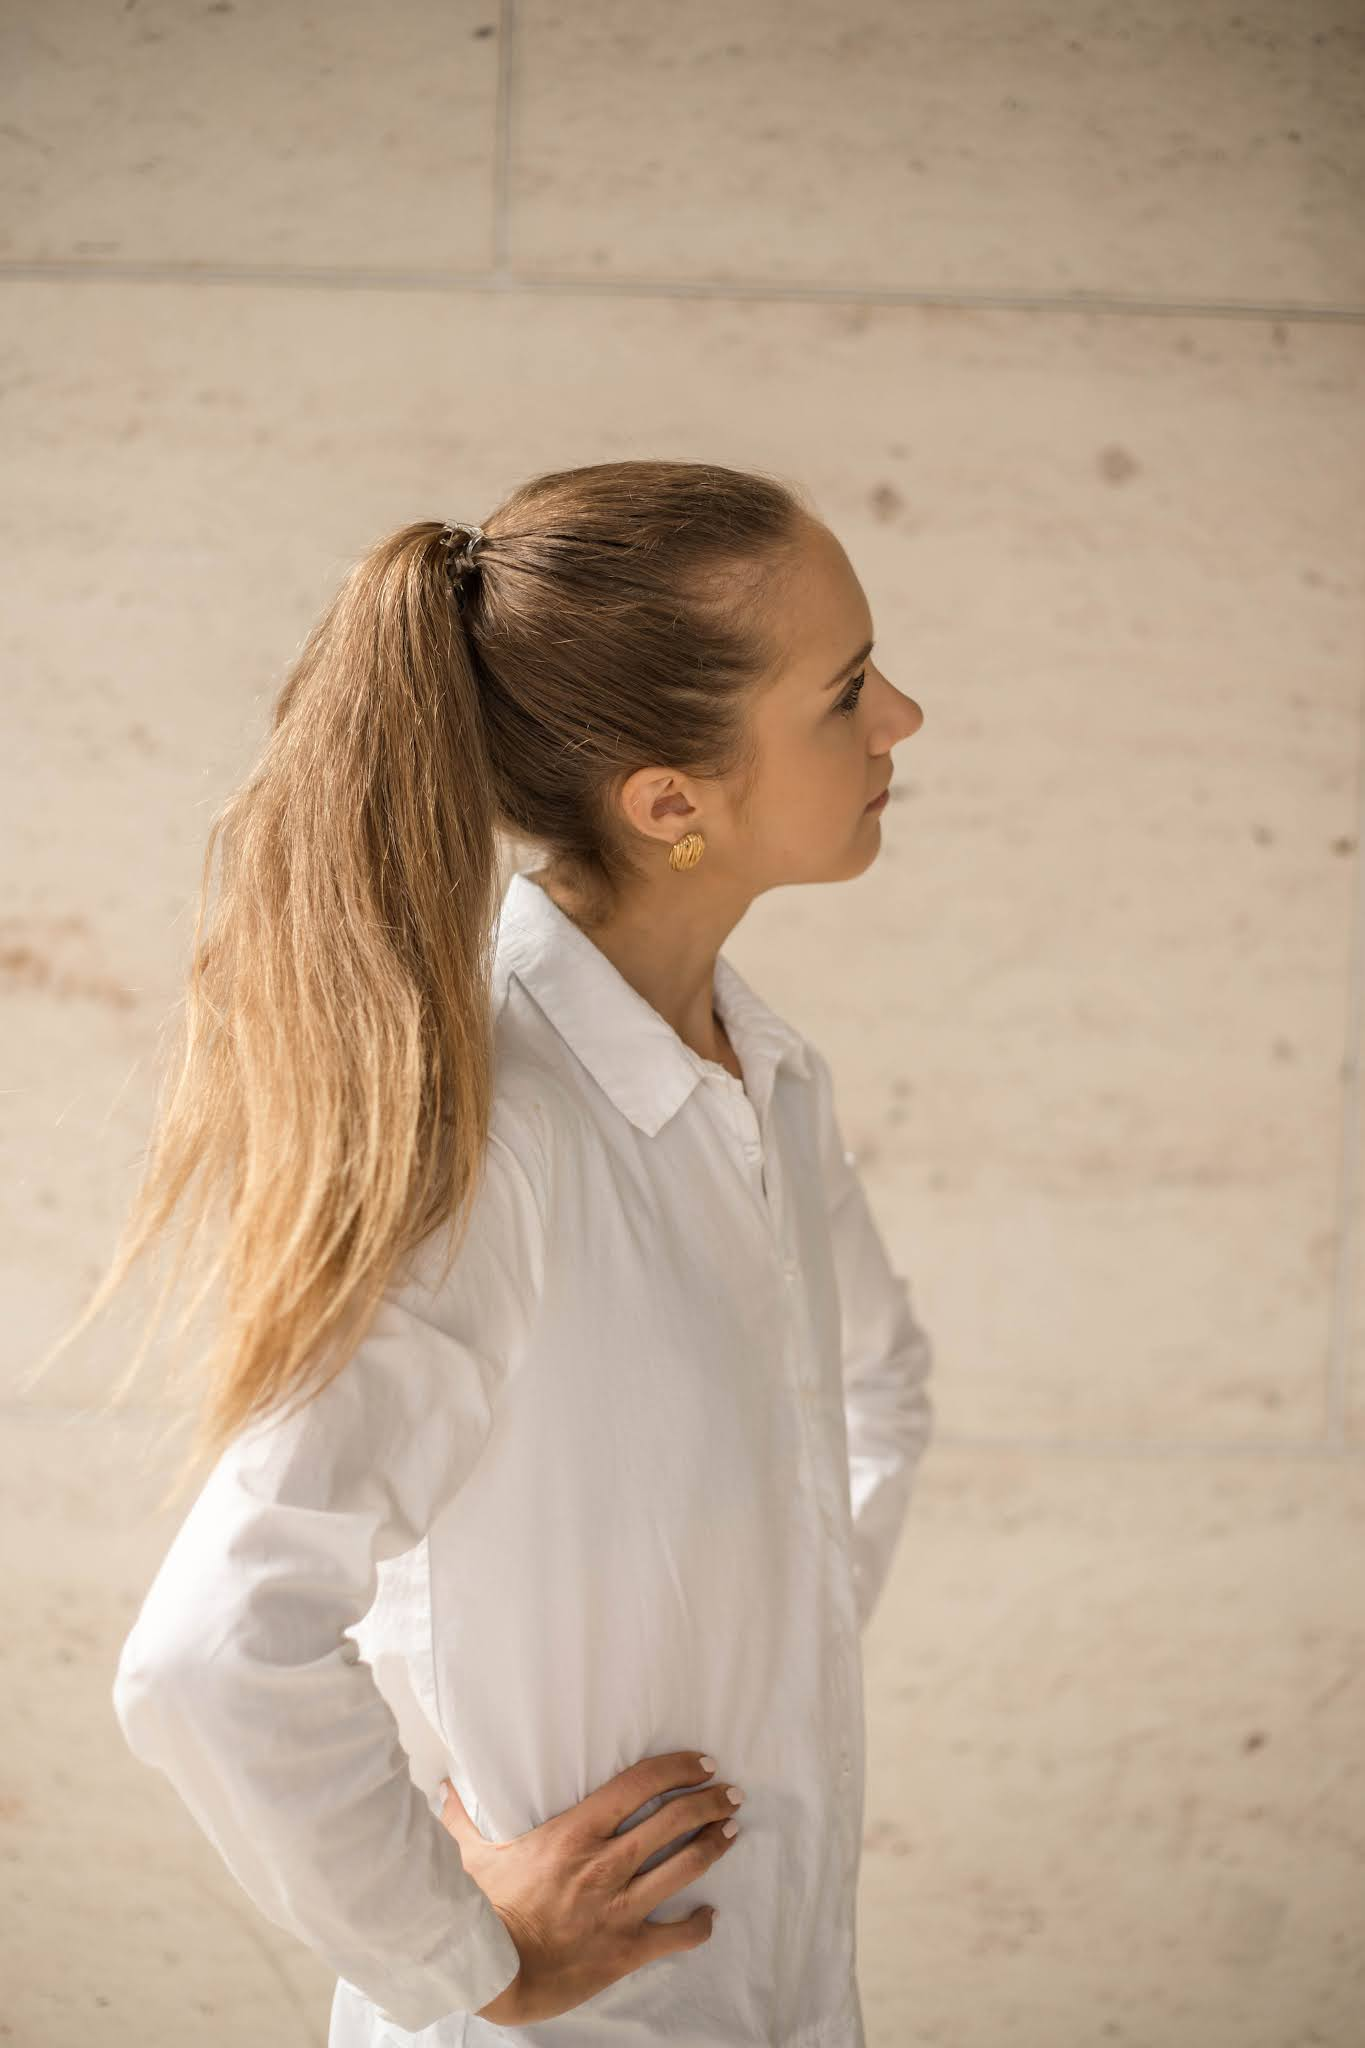 Valkoinen paitamekko, asuinspiraatio // White shirt dress, outfit inspiration